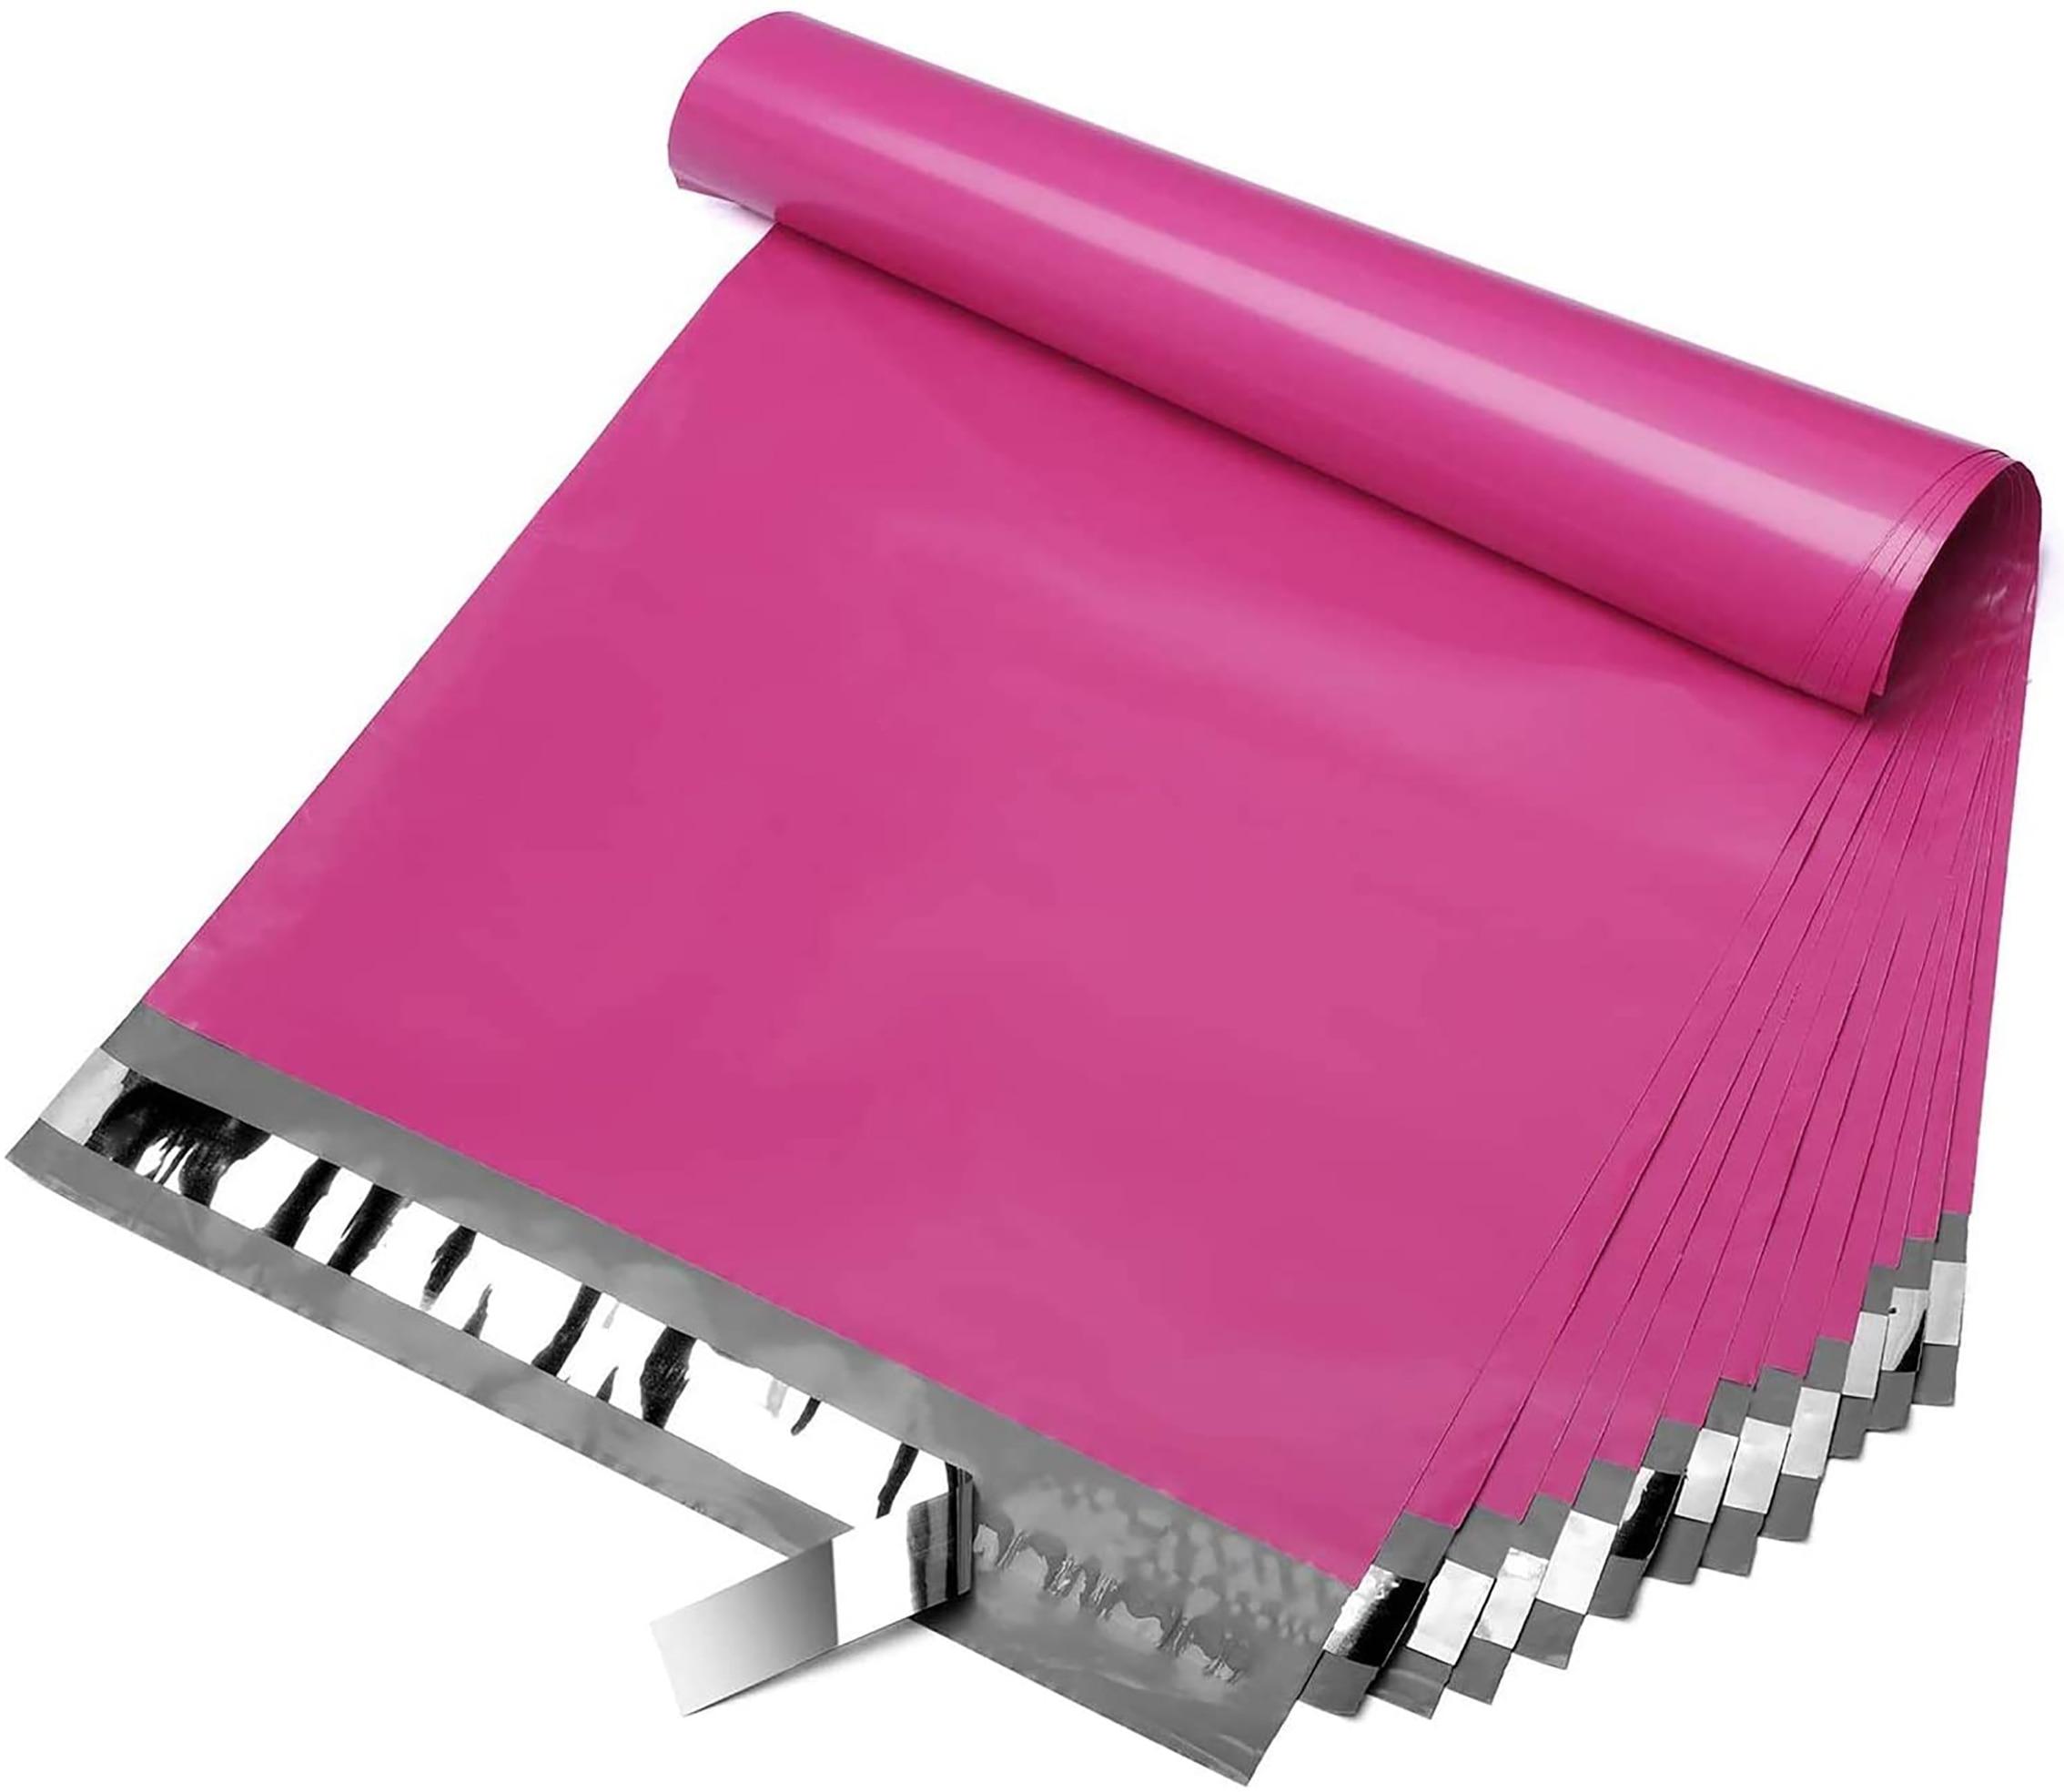 100Pieces/Bag Plastic Mailer Envelope Bags Courier Bag Poly Shipping Mailing Pink Packaging Bag Parcel Storage Plastic Bag